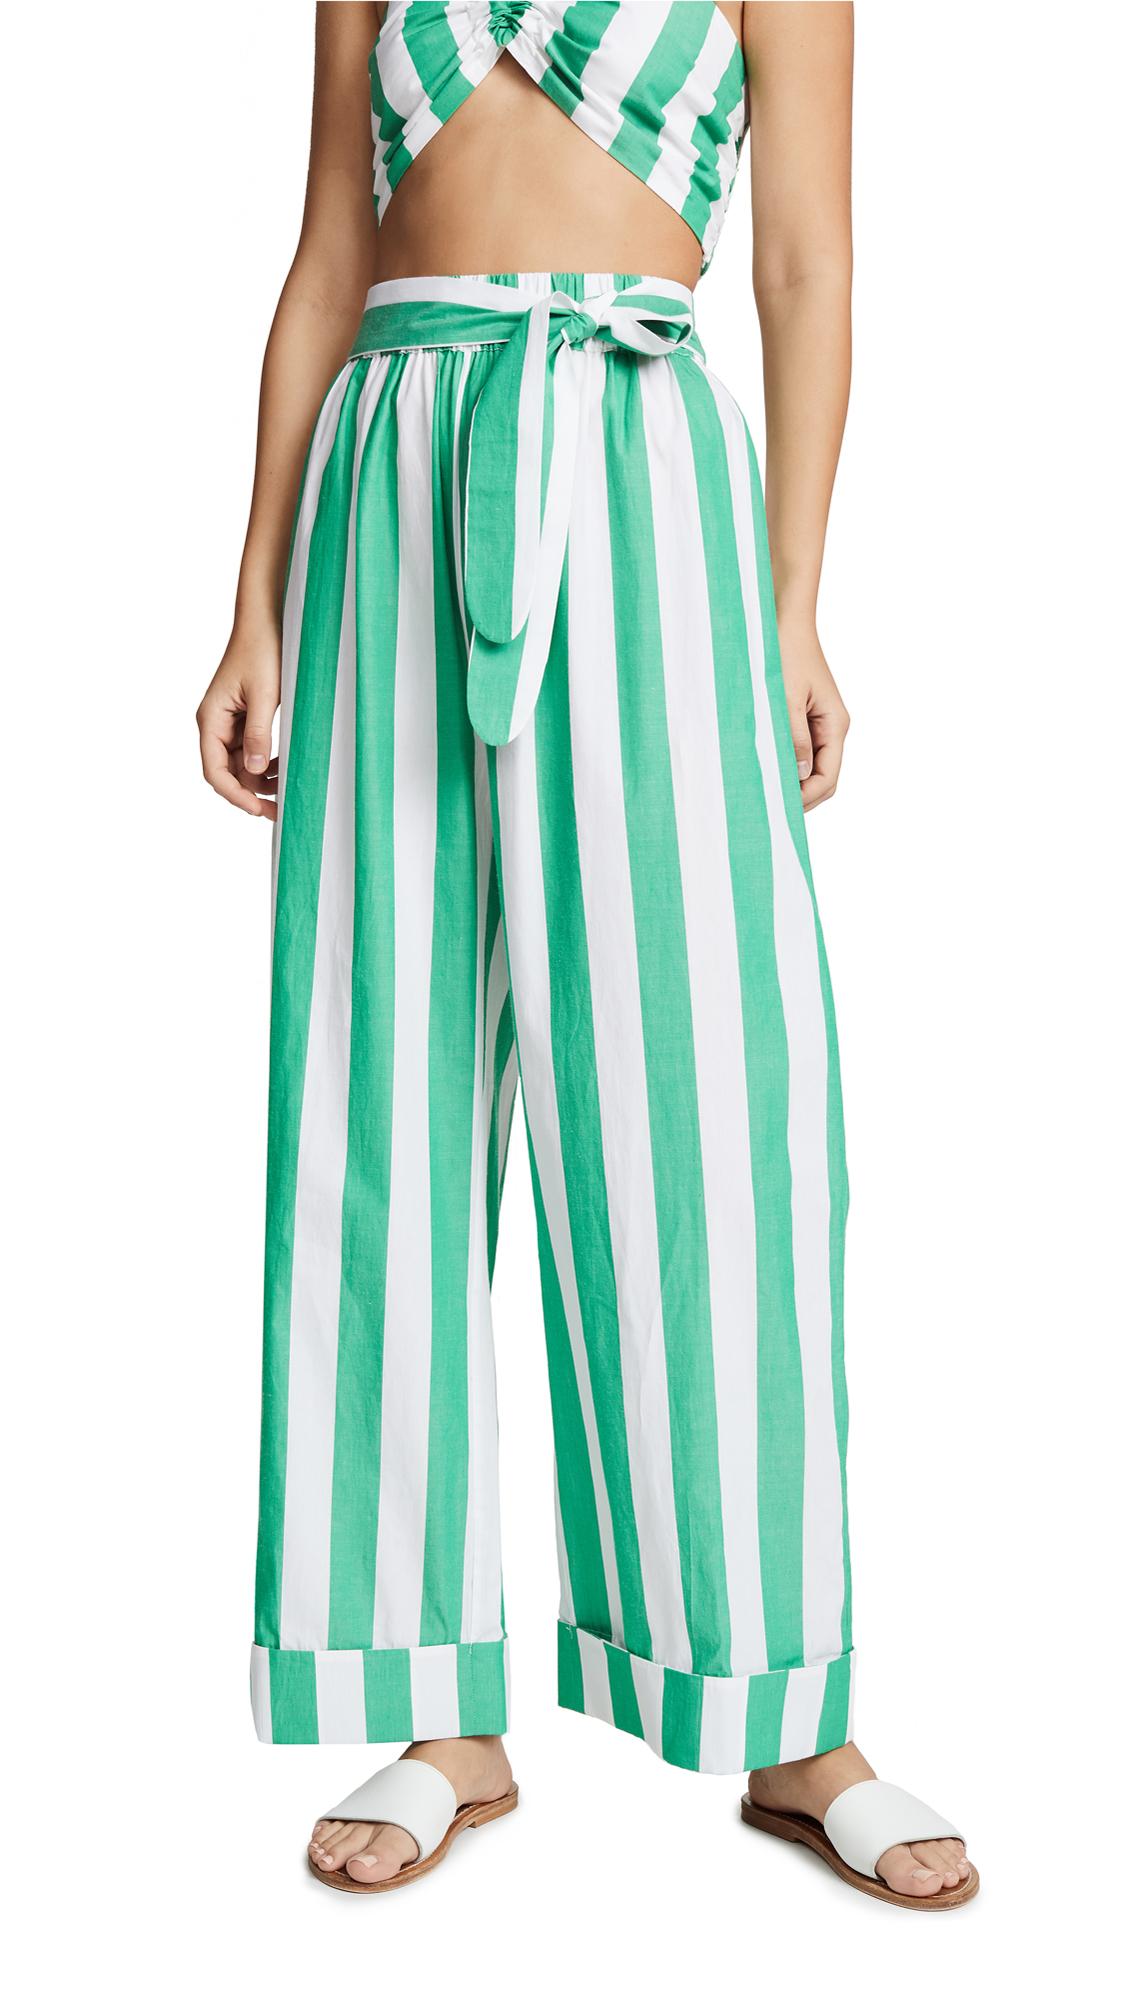 Mara Hoffman Sasha Pants - Bungalow Stripe